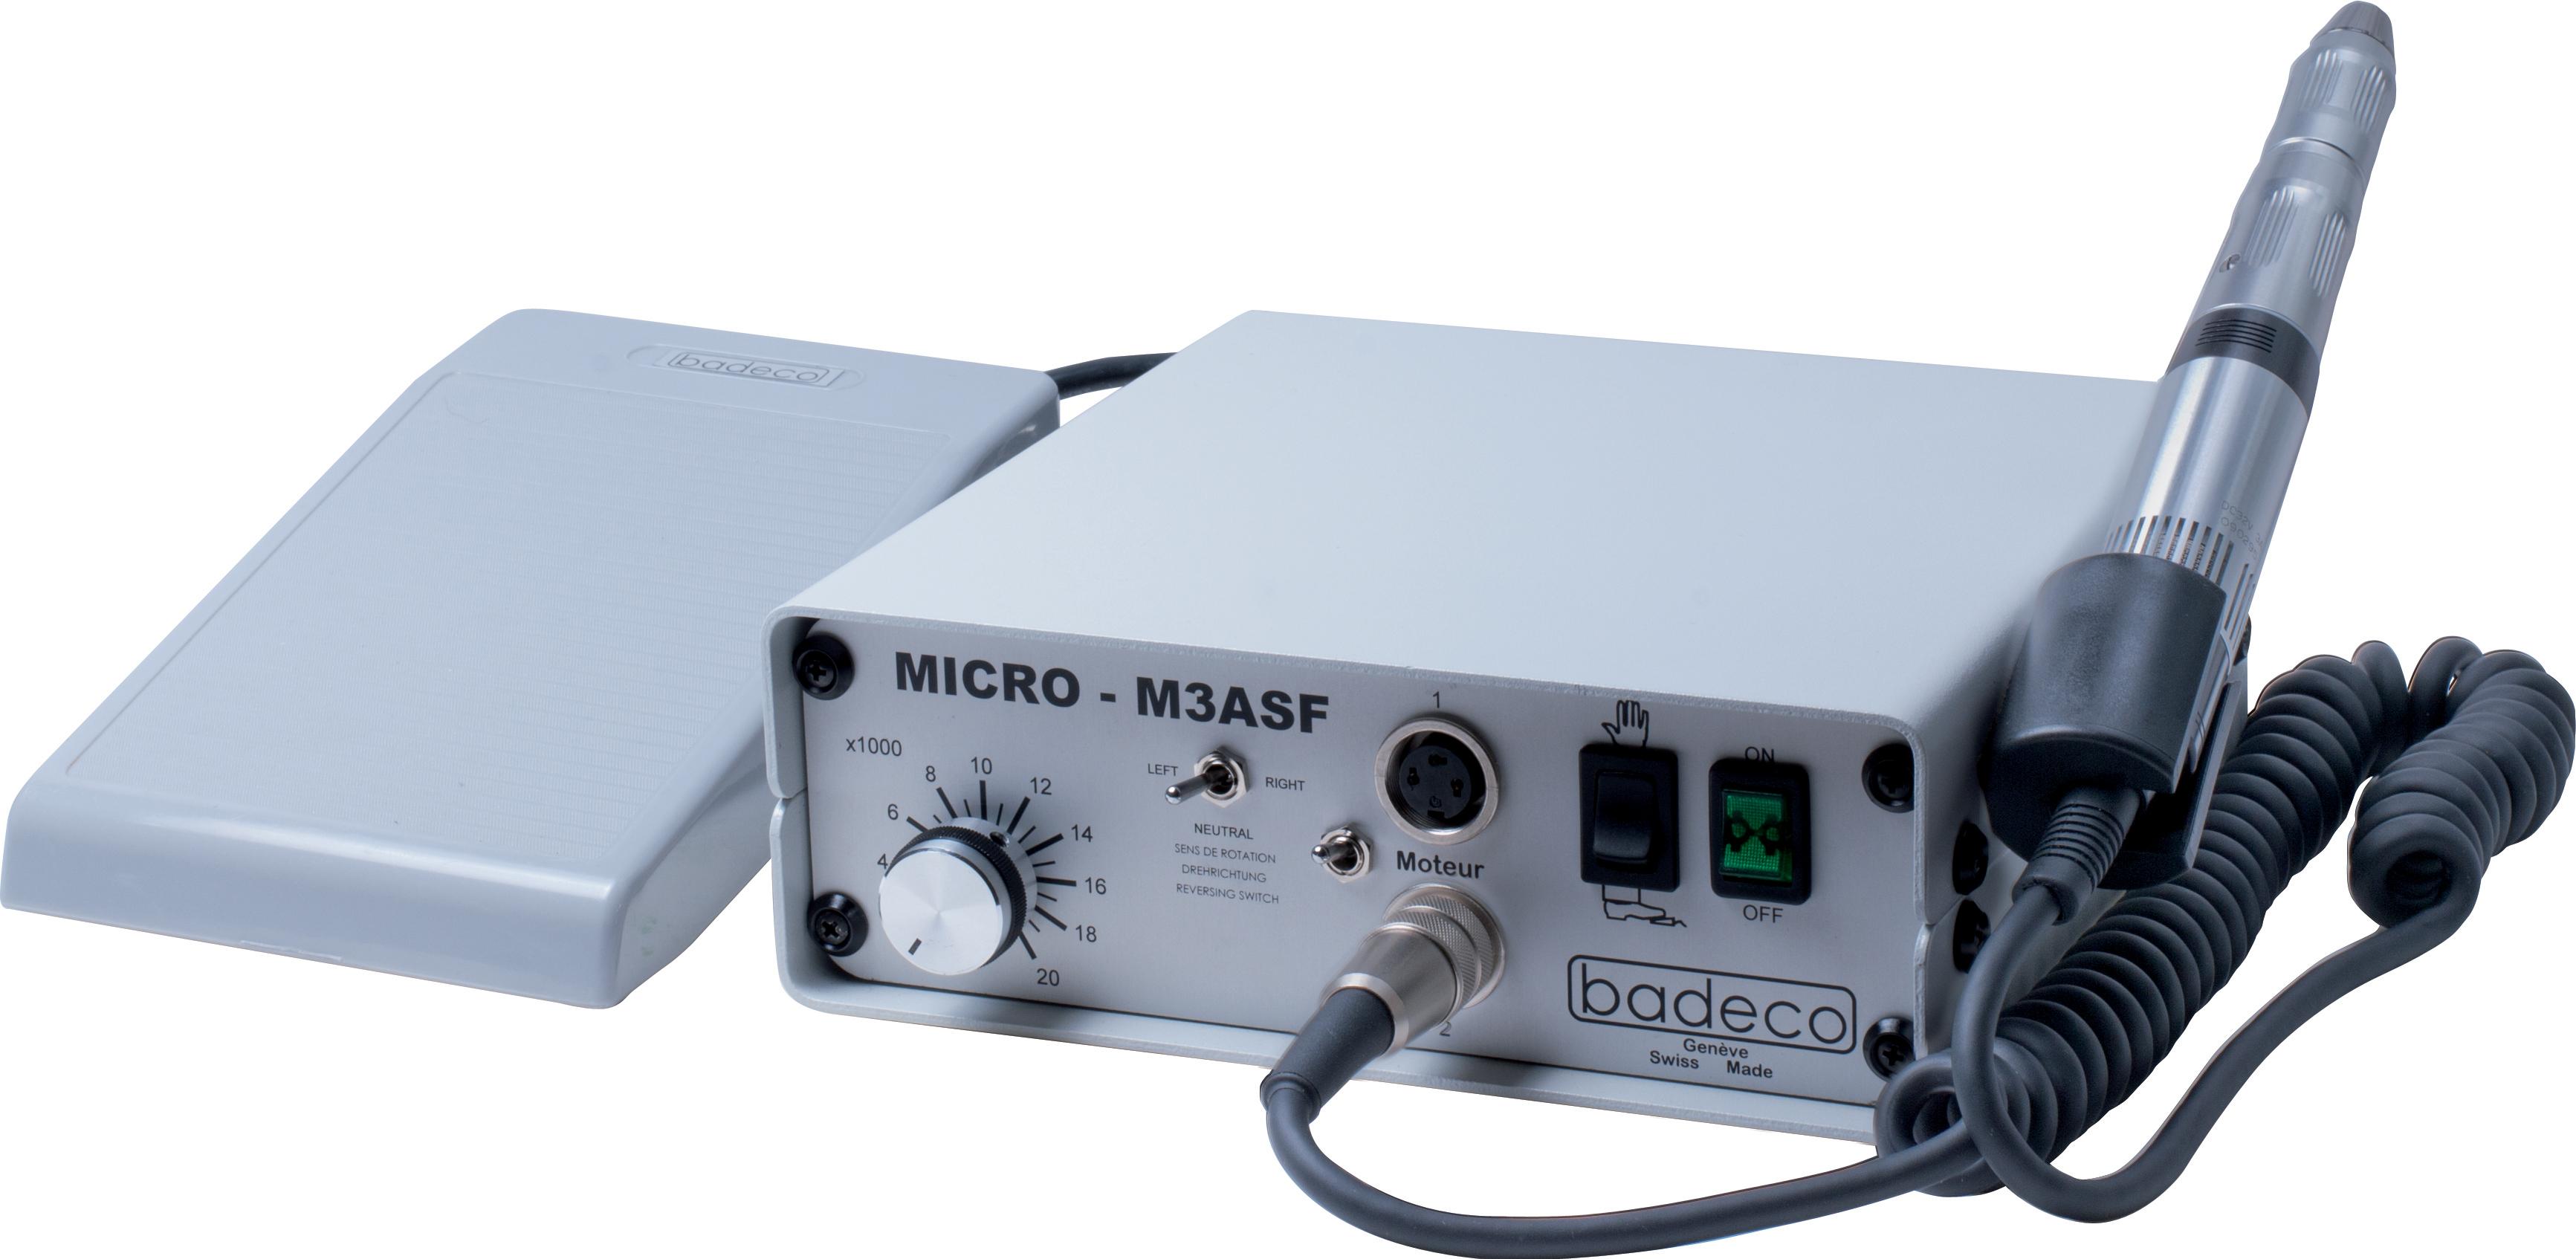 Mikromotor Set Badeco Premium